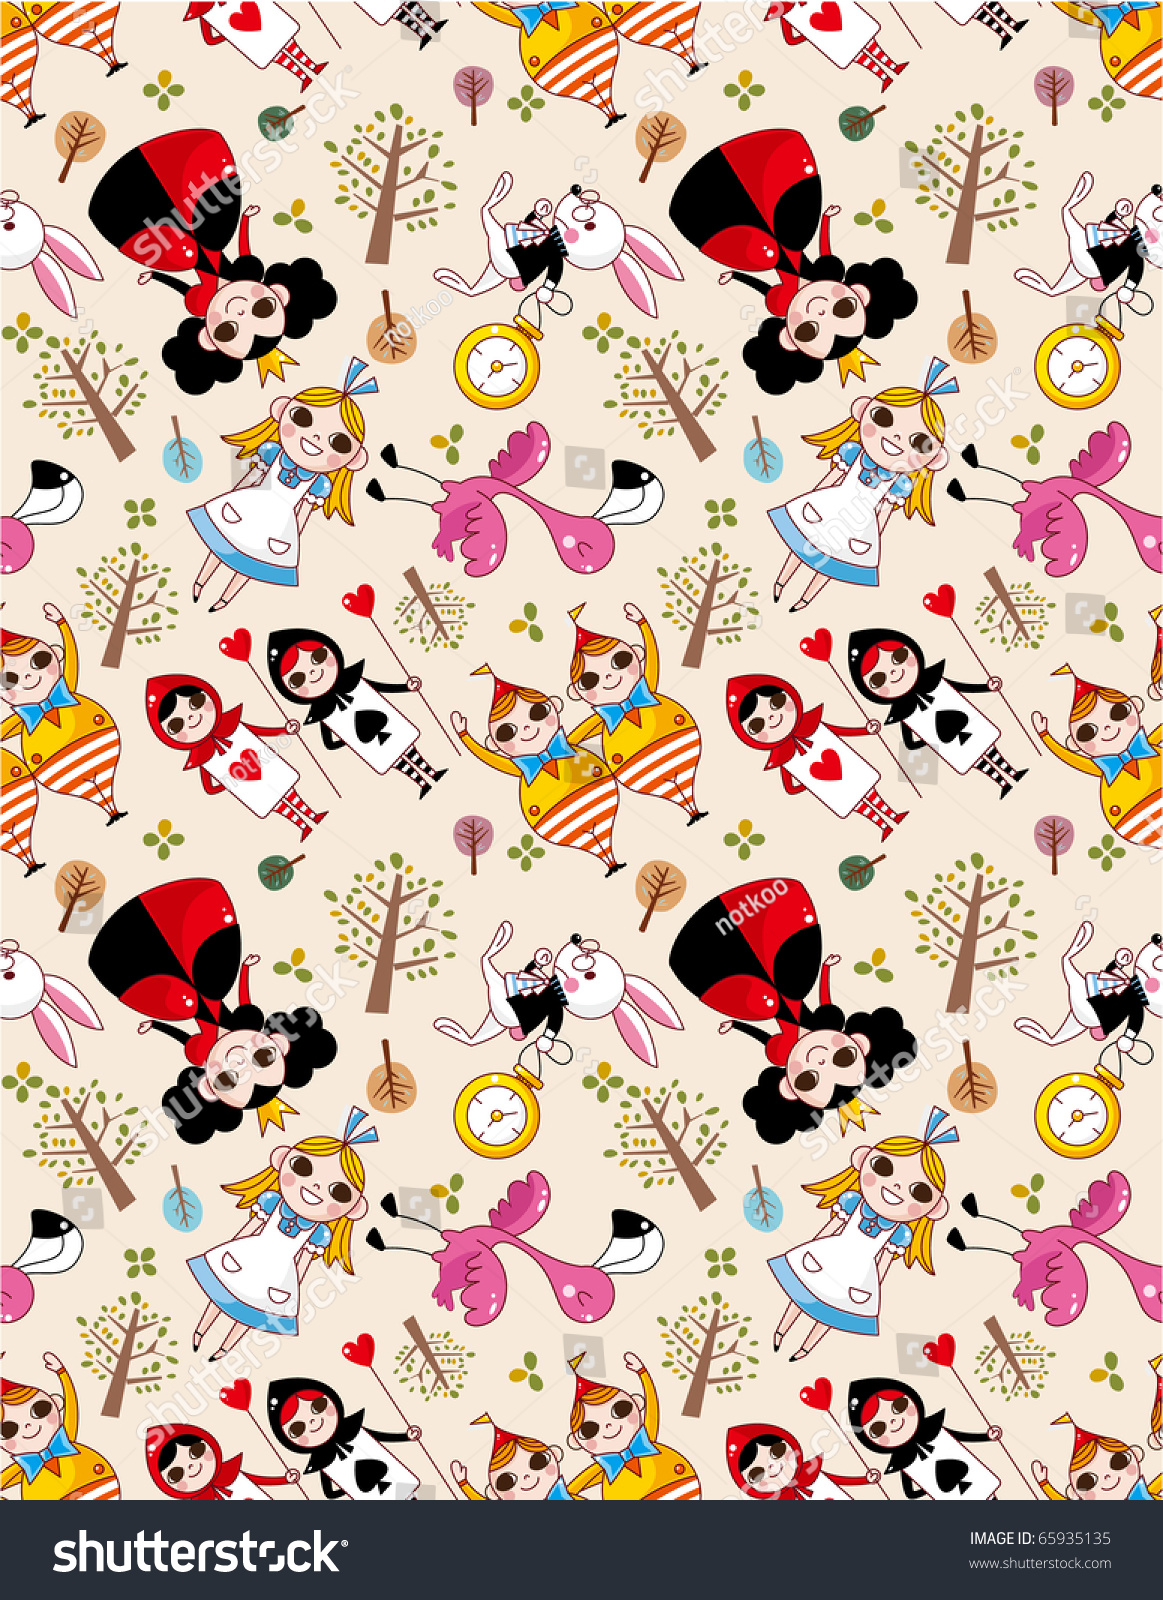 Cartoon Girl And Boy Wallpaper Seamless Alice Wonderland Pattern Stock Vector 65935135